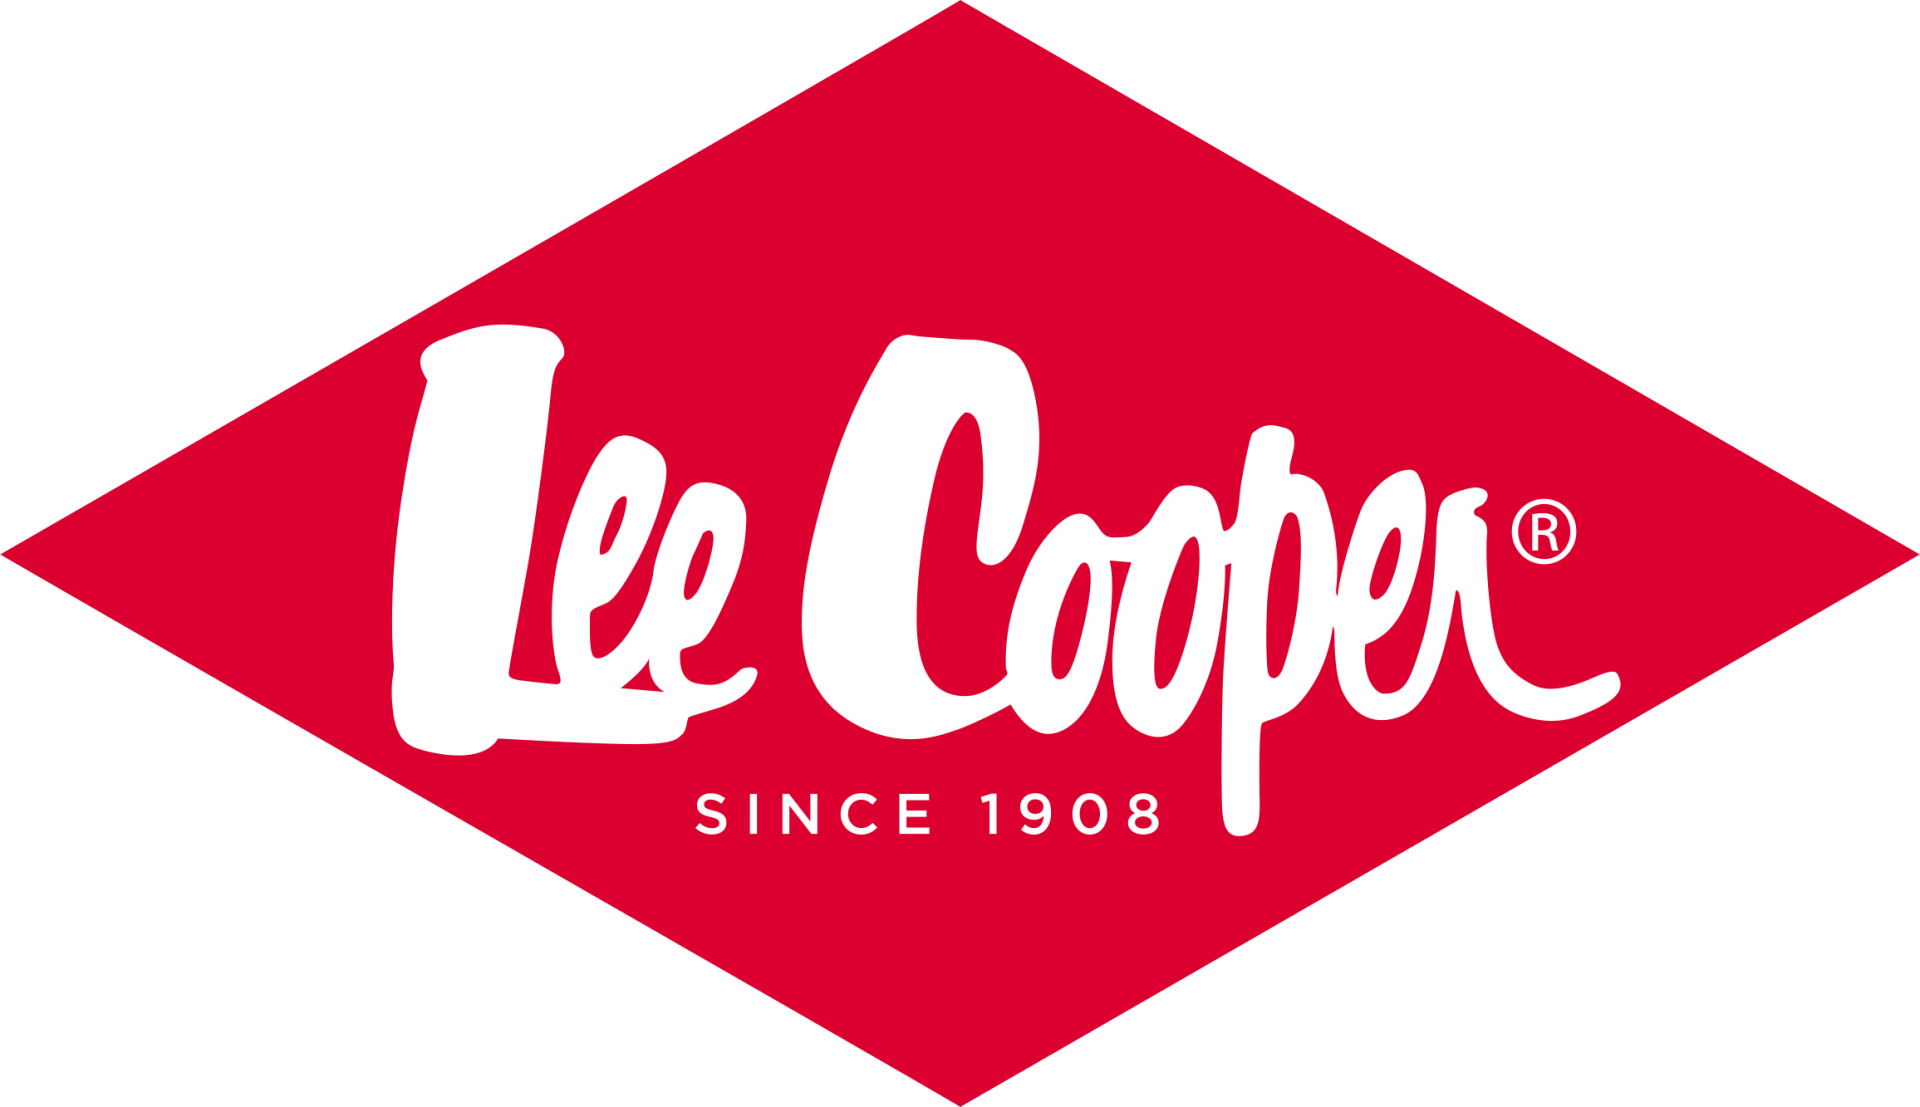 Lee cooper since 1908